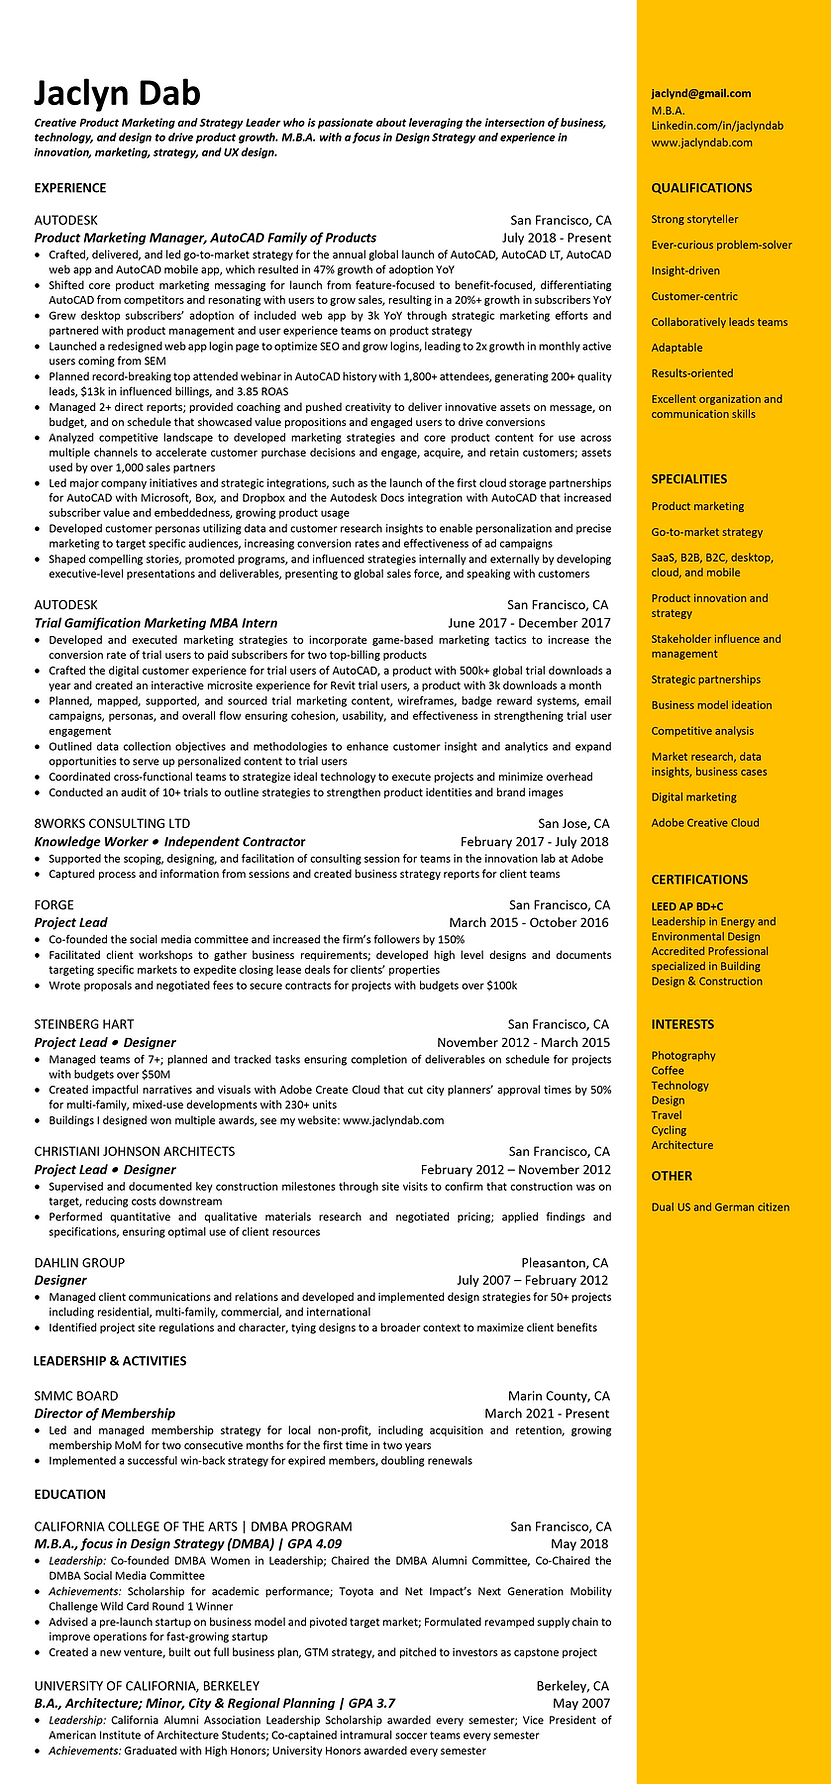 Jaclyn Dab Resume-web.png